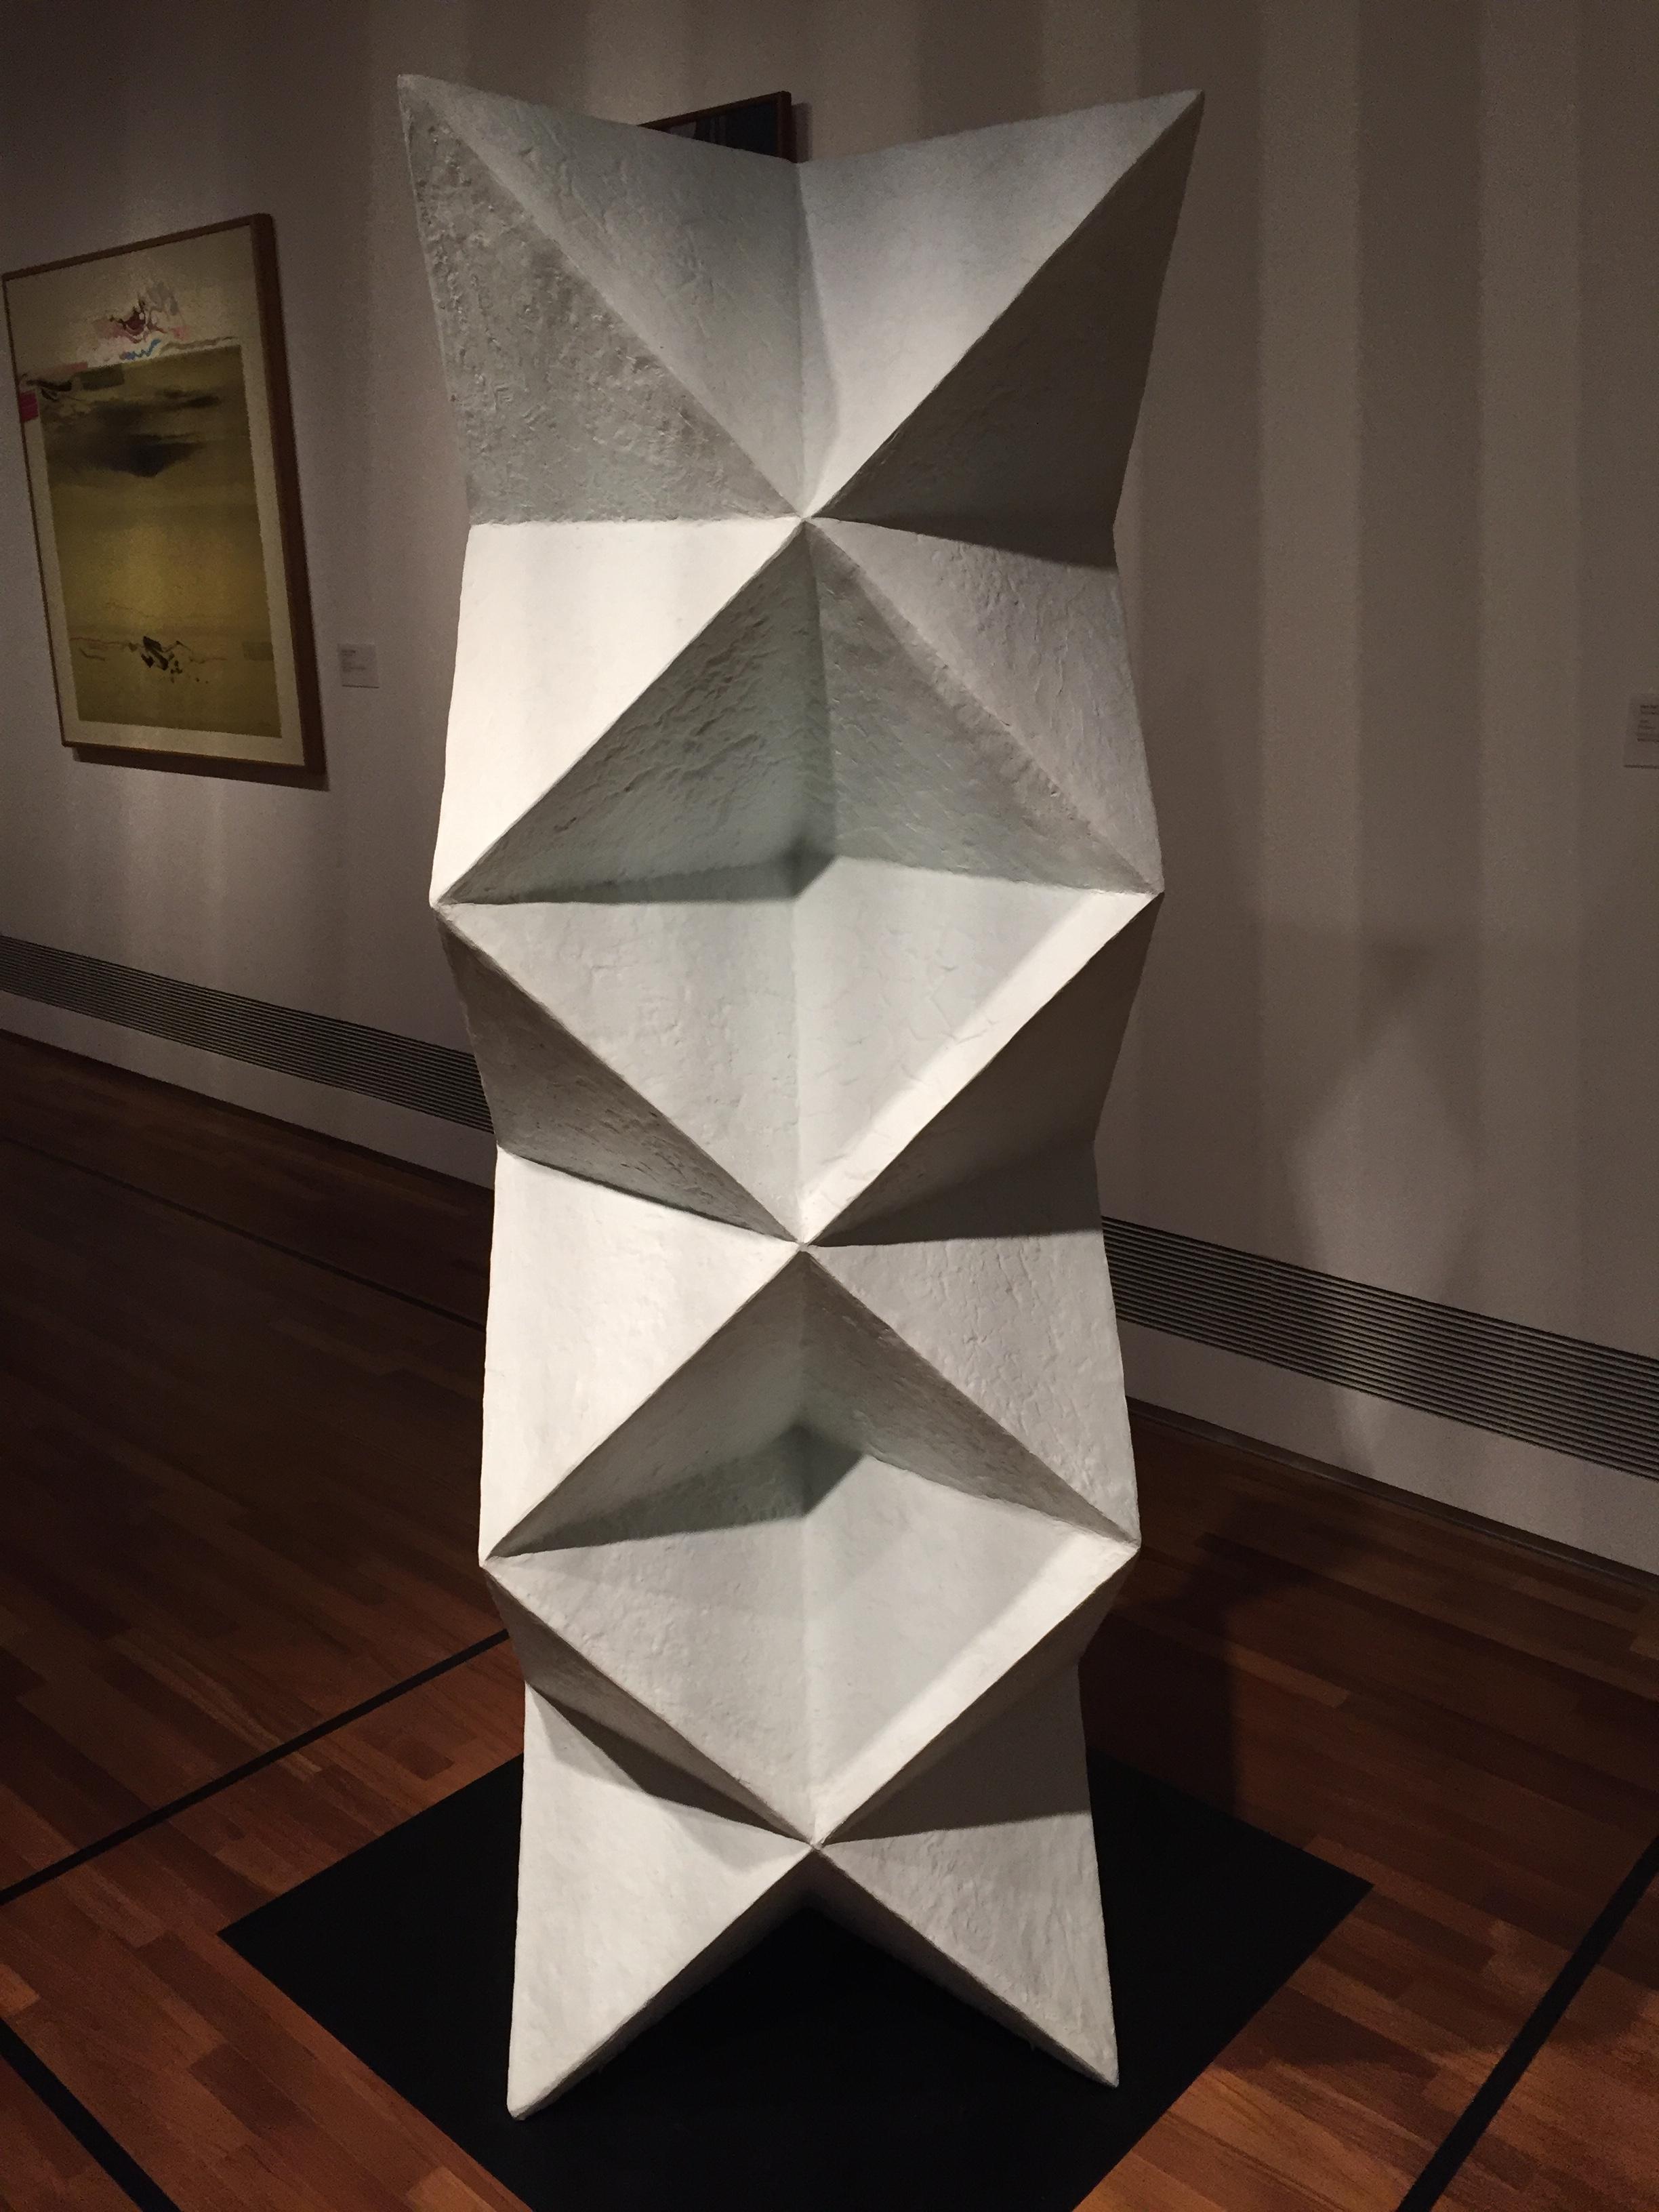 File Tetrahedron Interprenetration 1993 By Han Sai Por National Gallery Singapore 20160101 Jpg